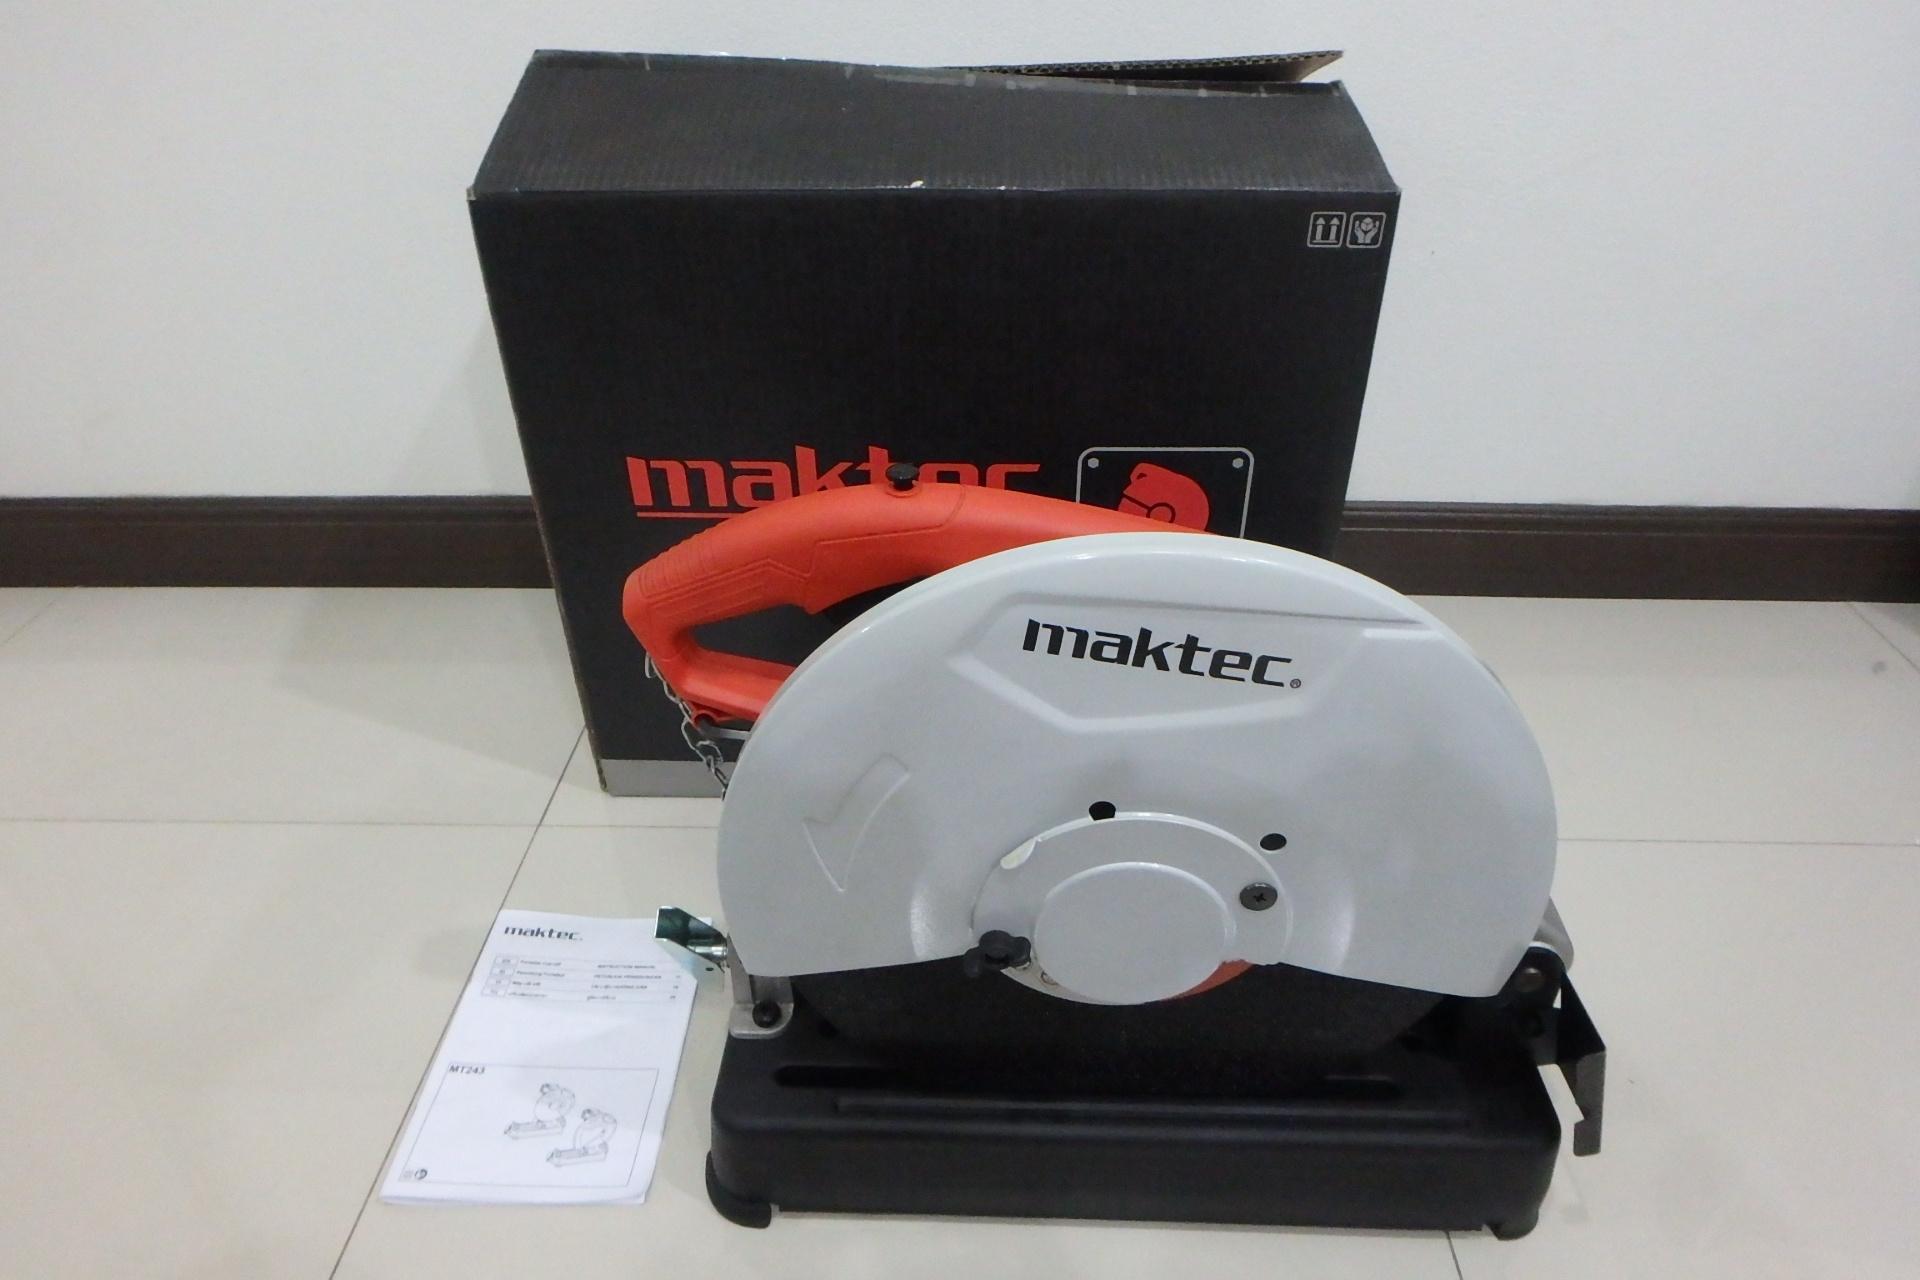 Máy cắt sắt Maktec MT243 (355mm)